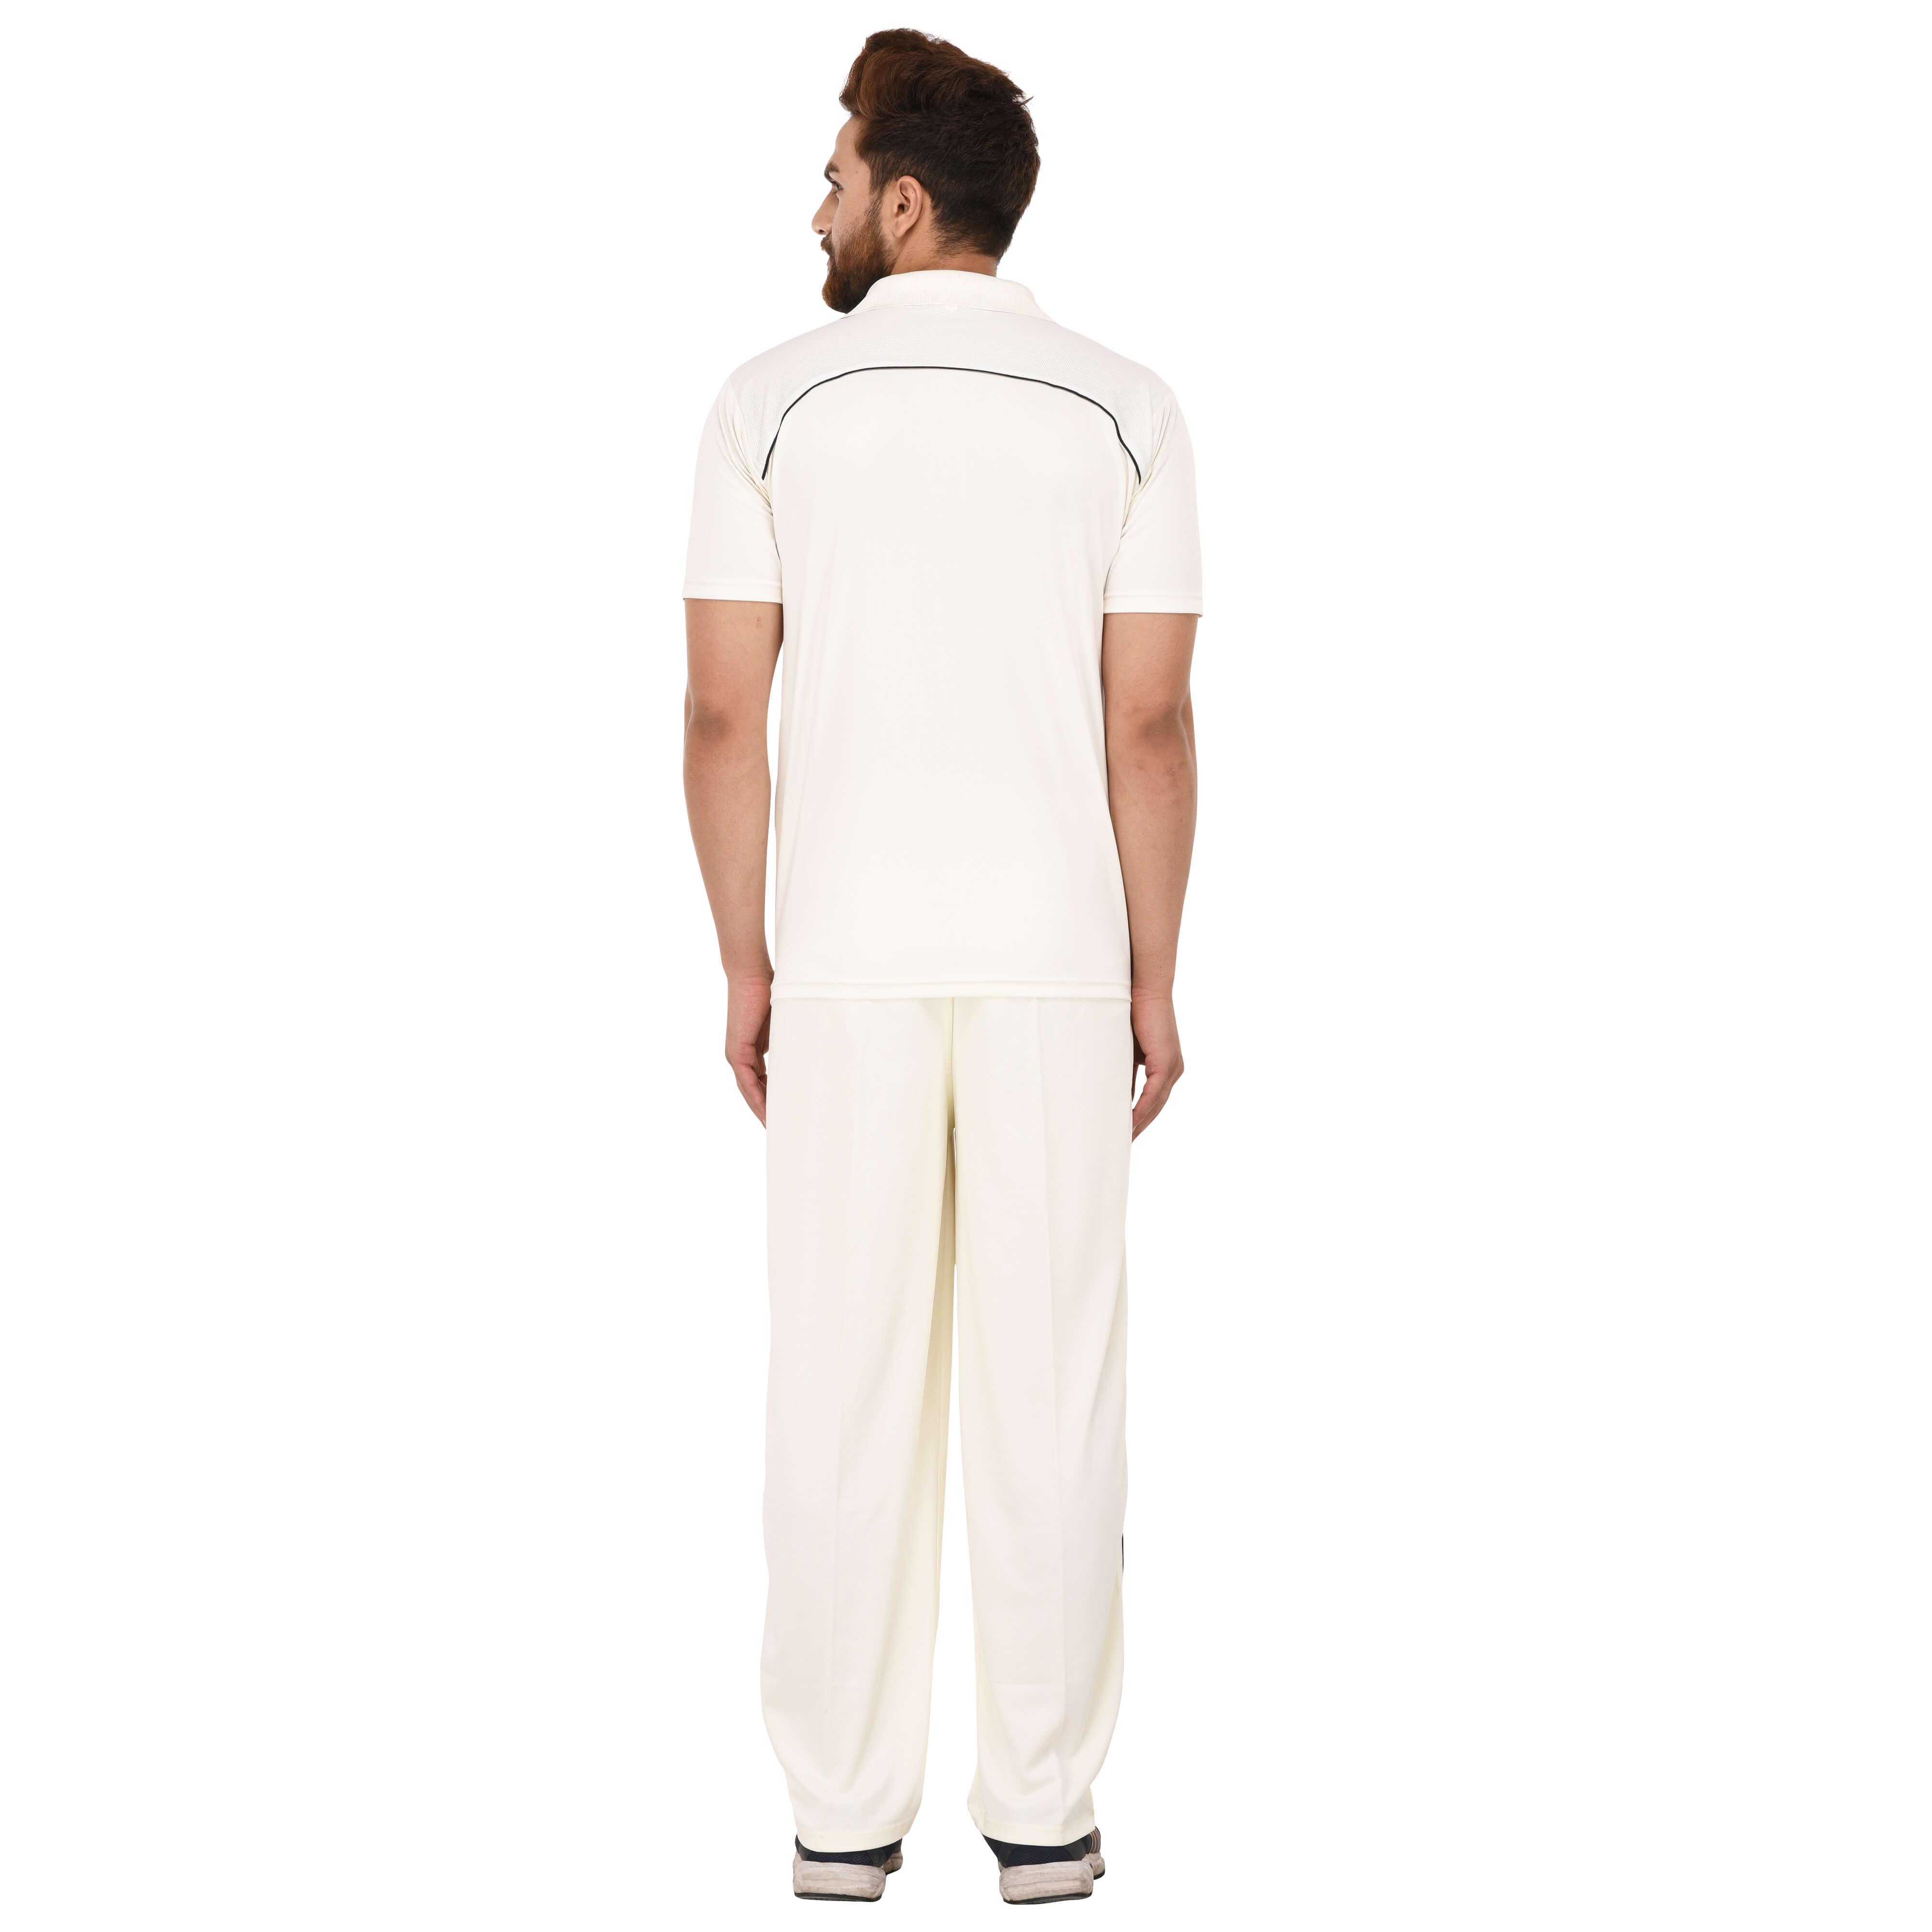 Cricket Pants Manufacturers, Wholesale Suppliers